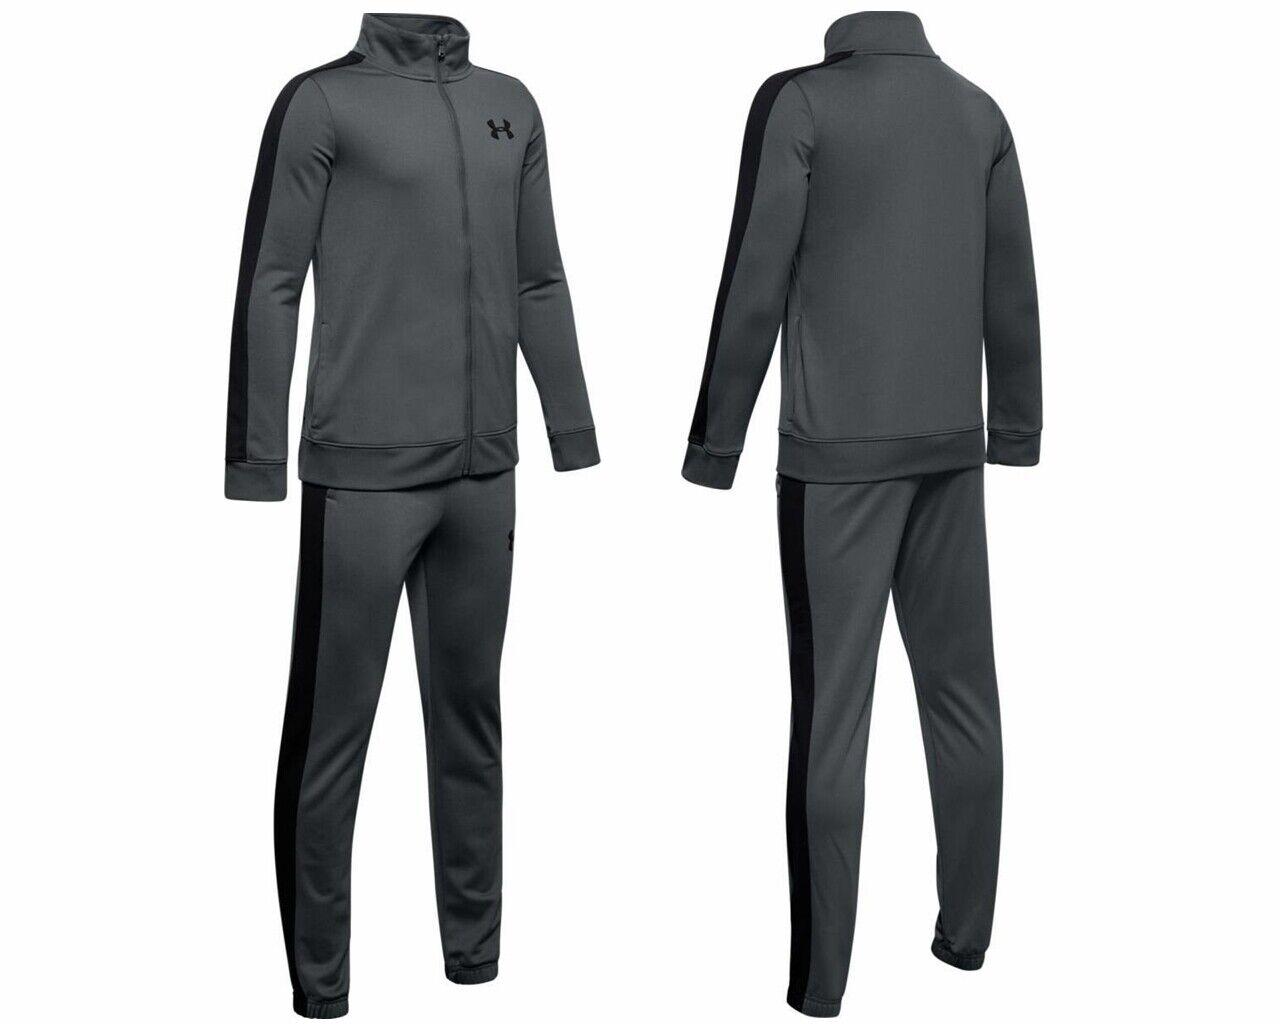 Under Armour Juniors 1347743 Full Zip Boys Tracksuit Grey Jogsuit